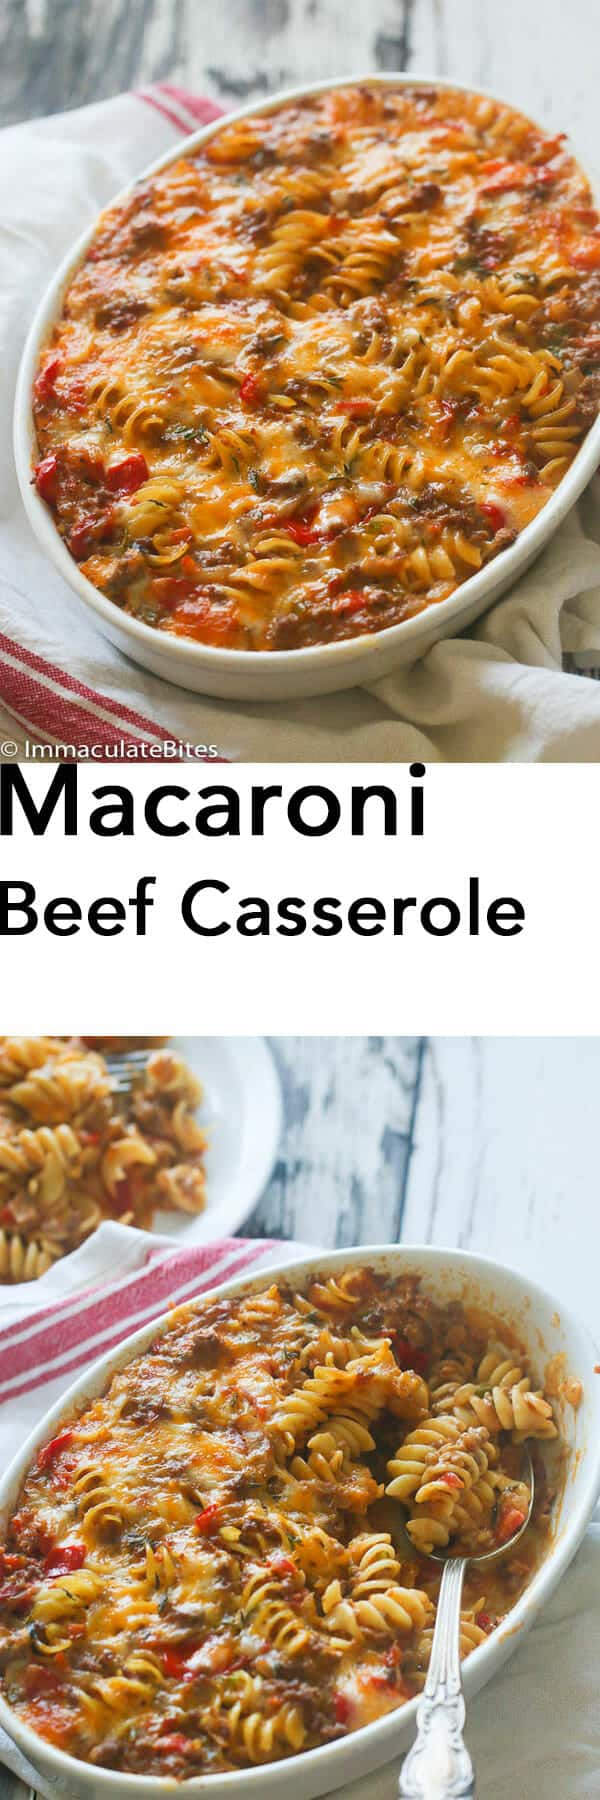 macaroni-beef-casserole